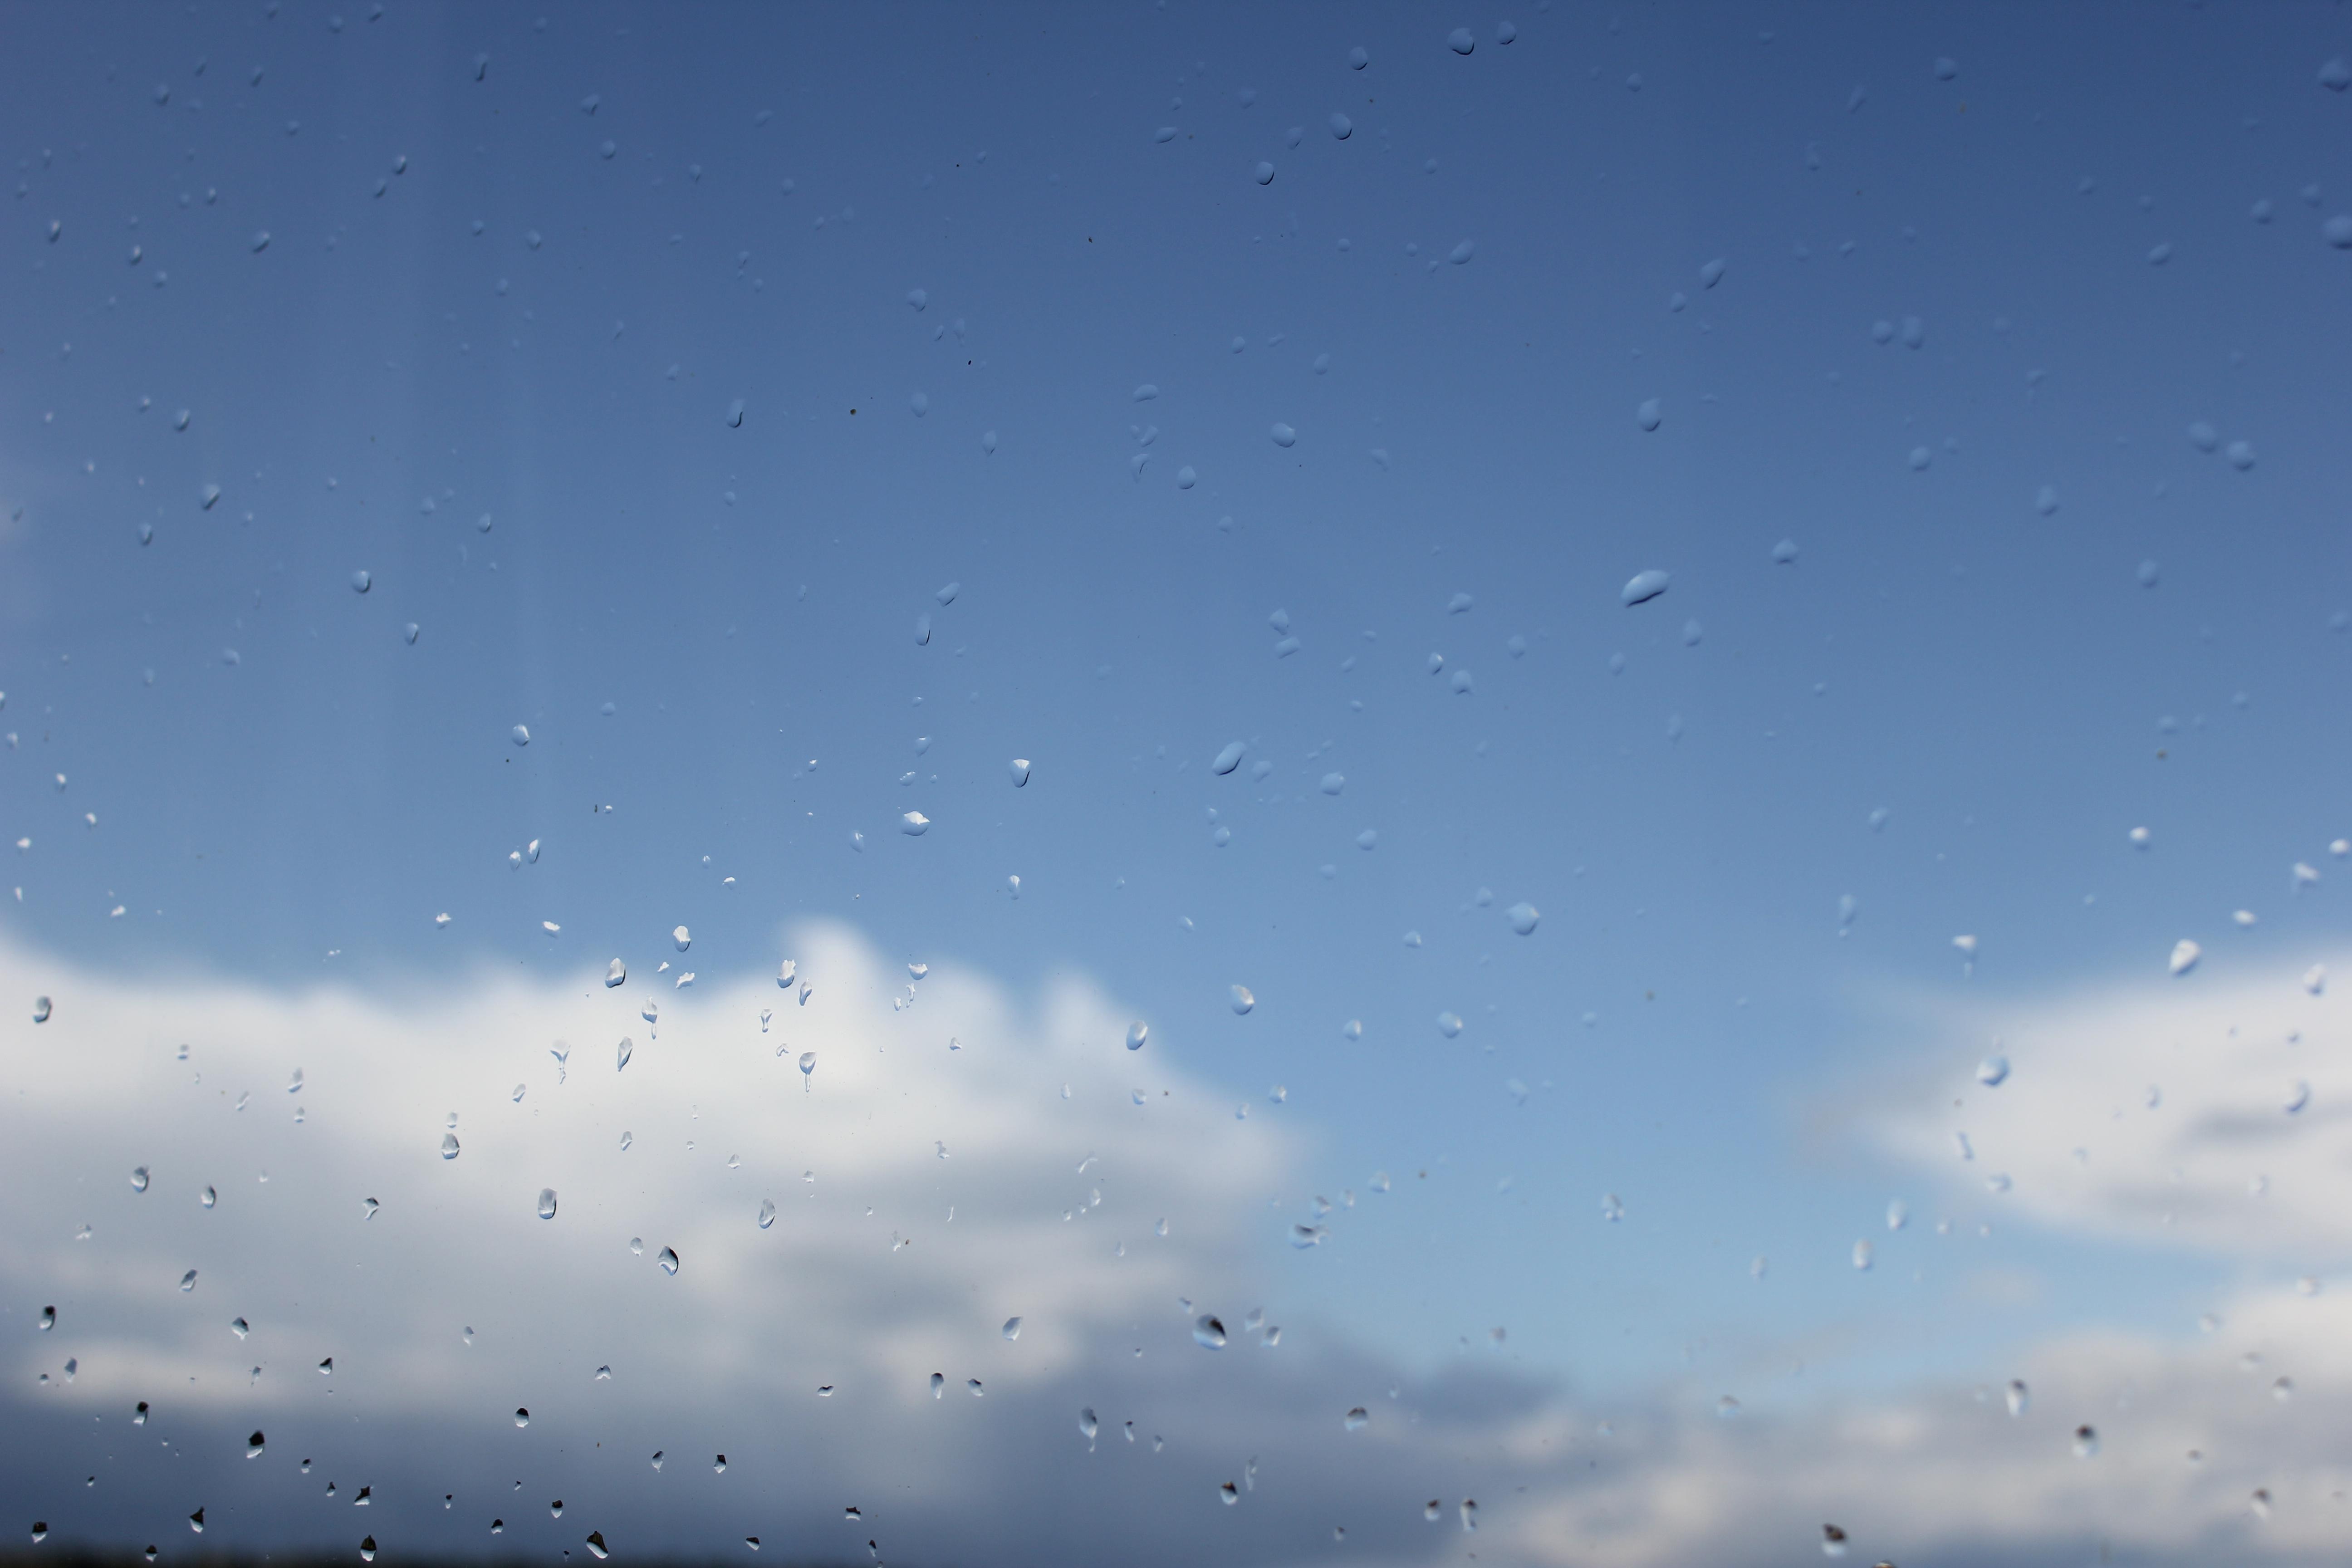 прелести небо сентября (23)